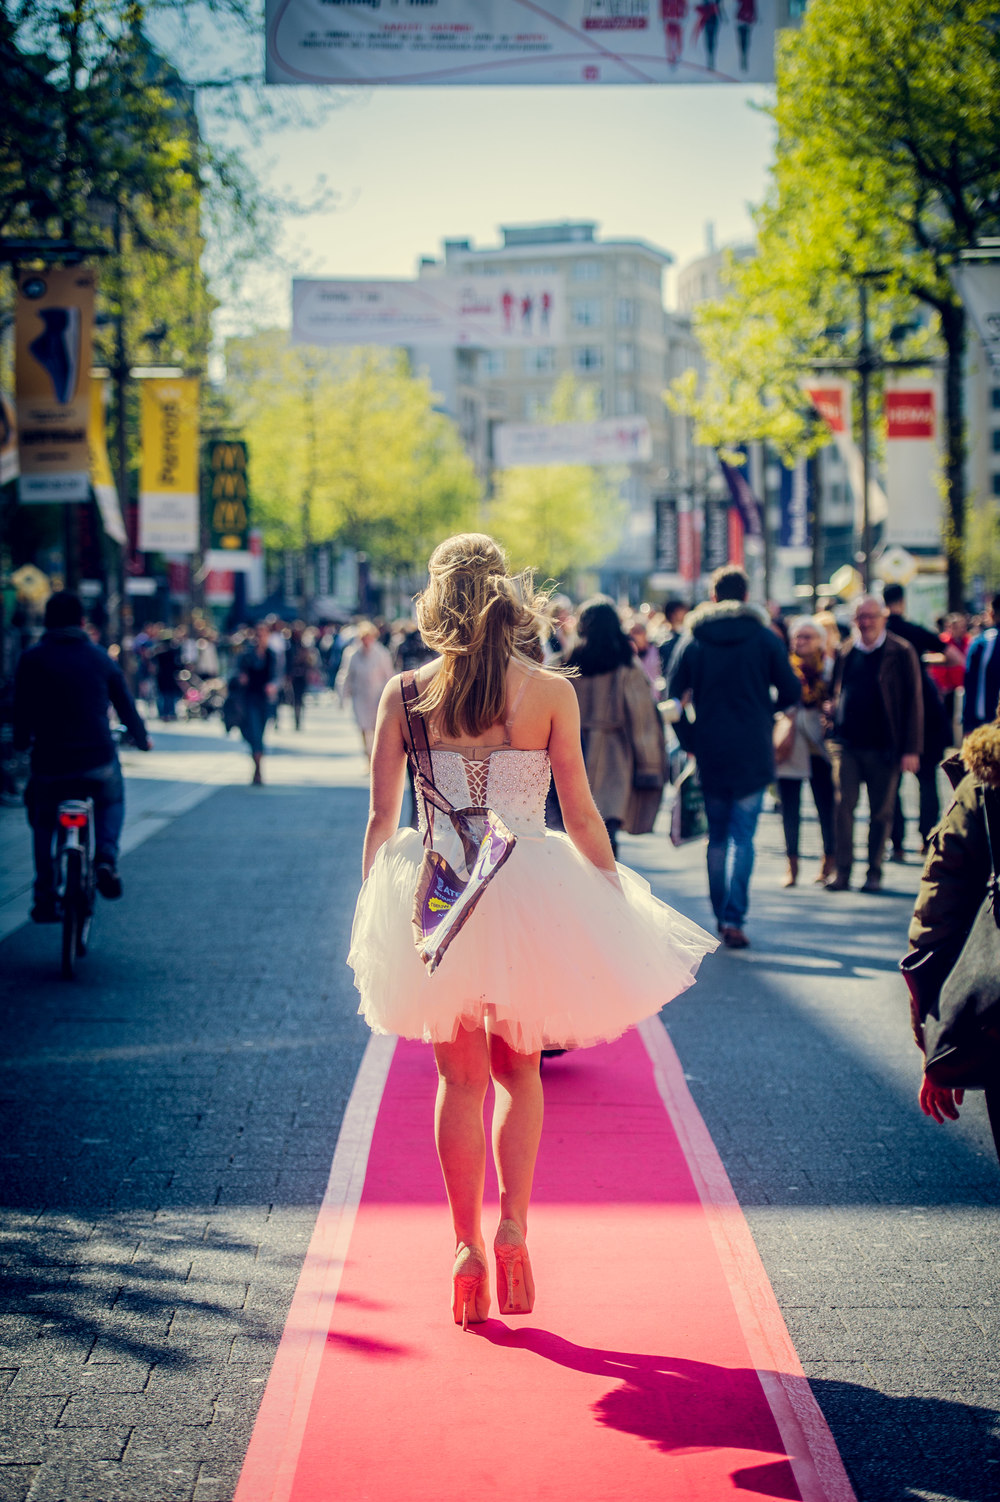 2016-05-01 - Meir Catwalk - Rode Loper @ Antwerpen - 054.jpg